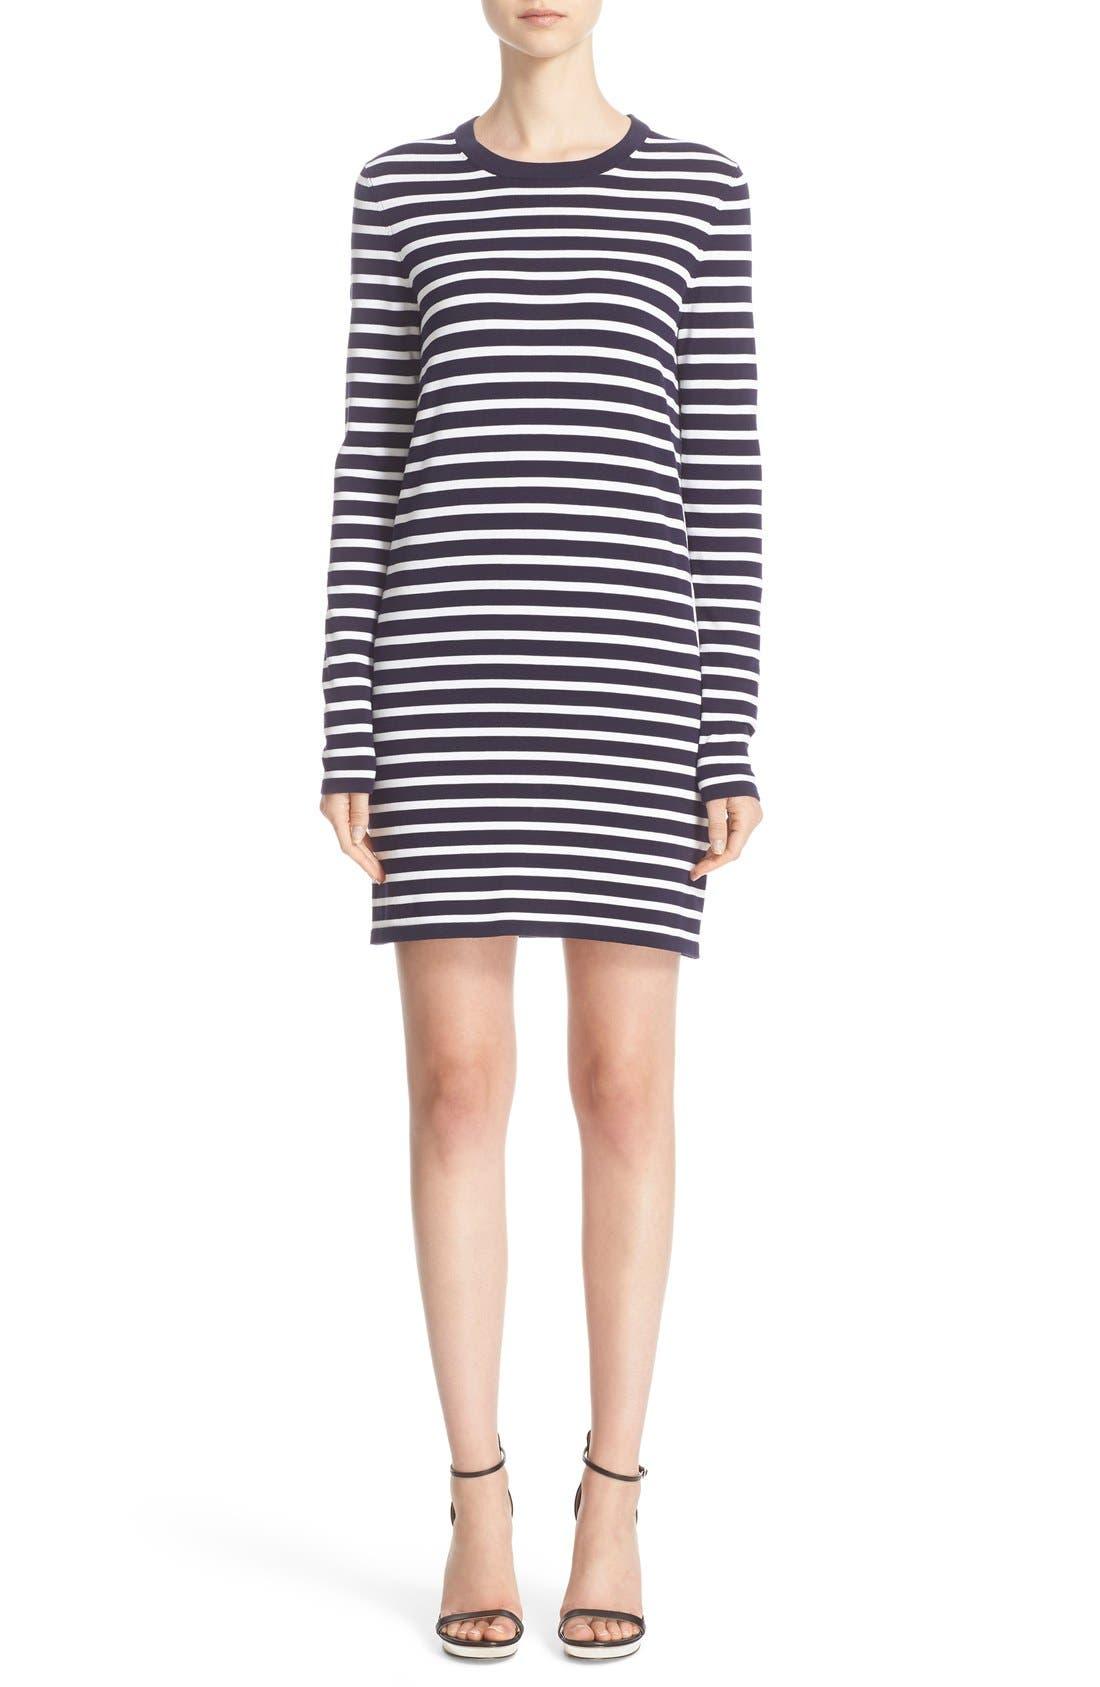 Alternate Image 1 Selected - Michael Kors Stripe T-Shirt Dress